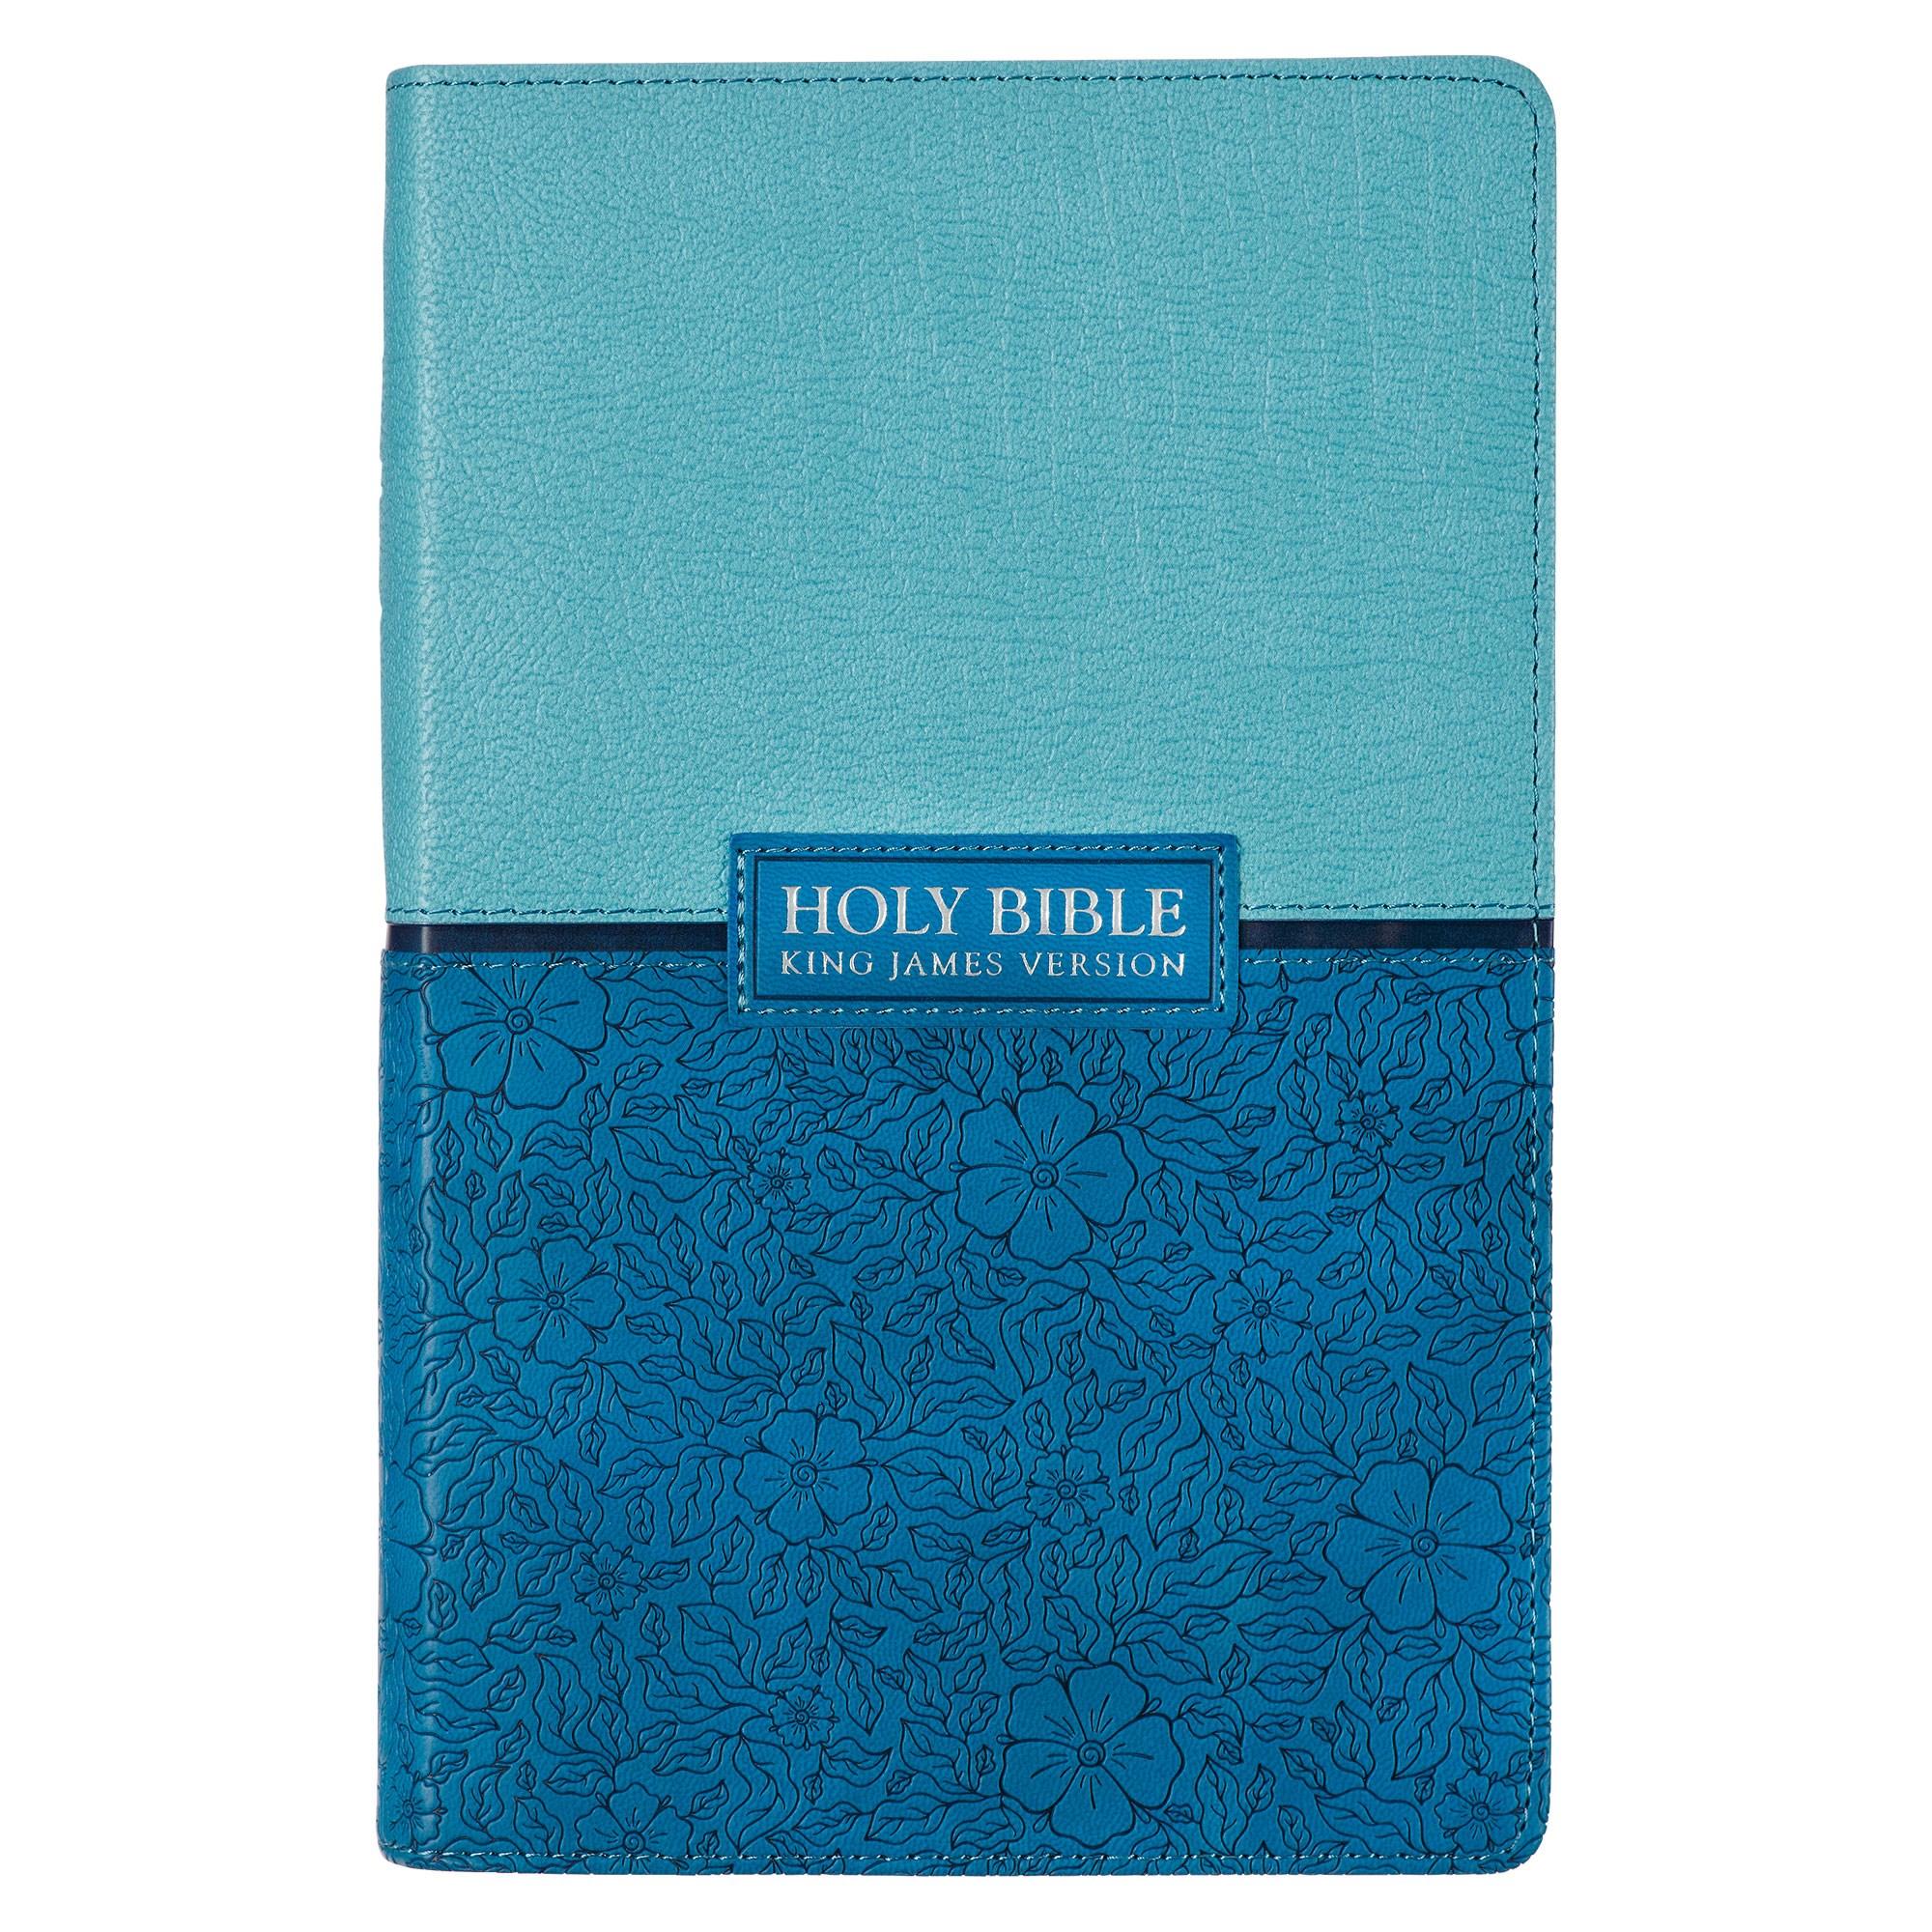 KJV Giant Print Bible-Blue/Teal LuxLeather